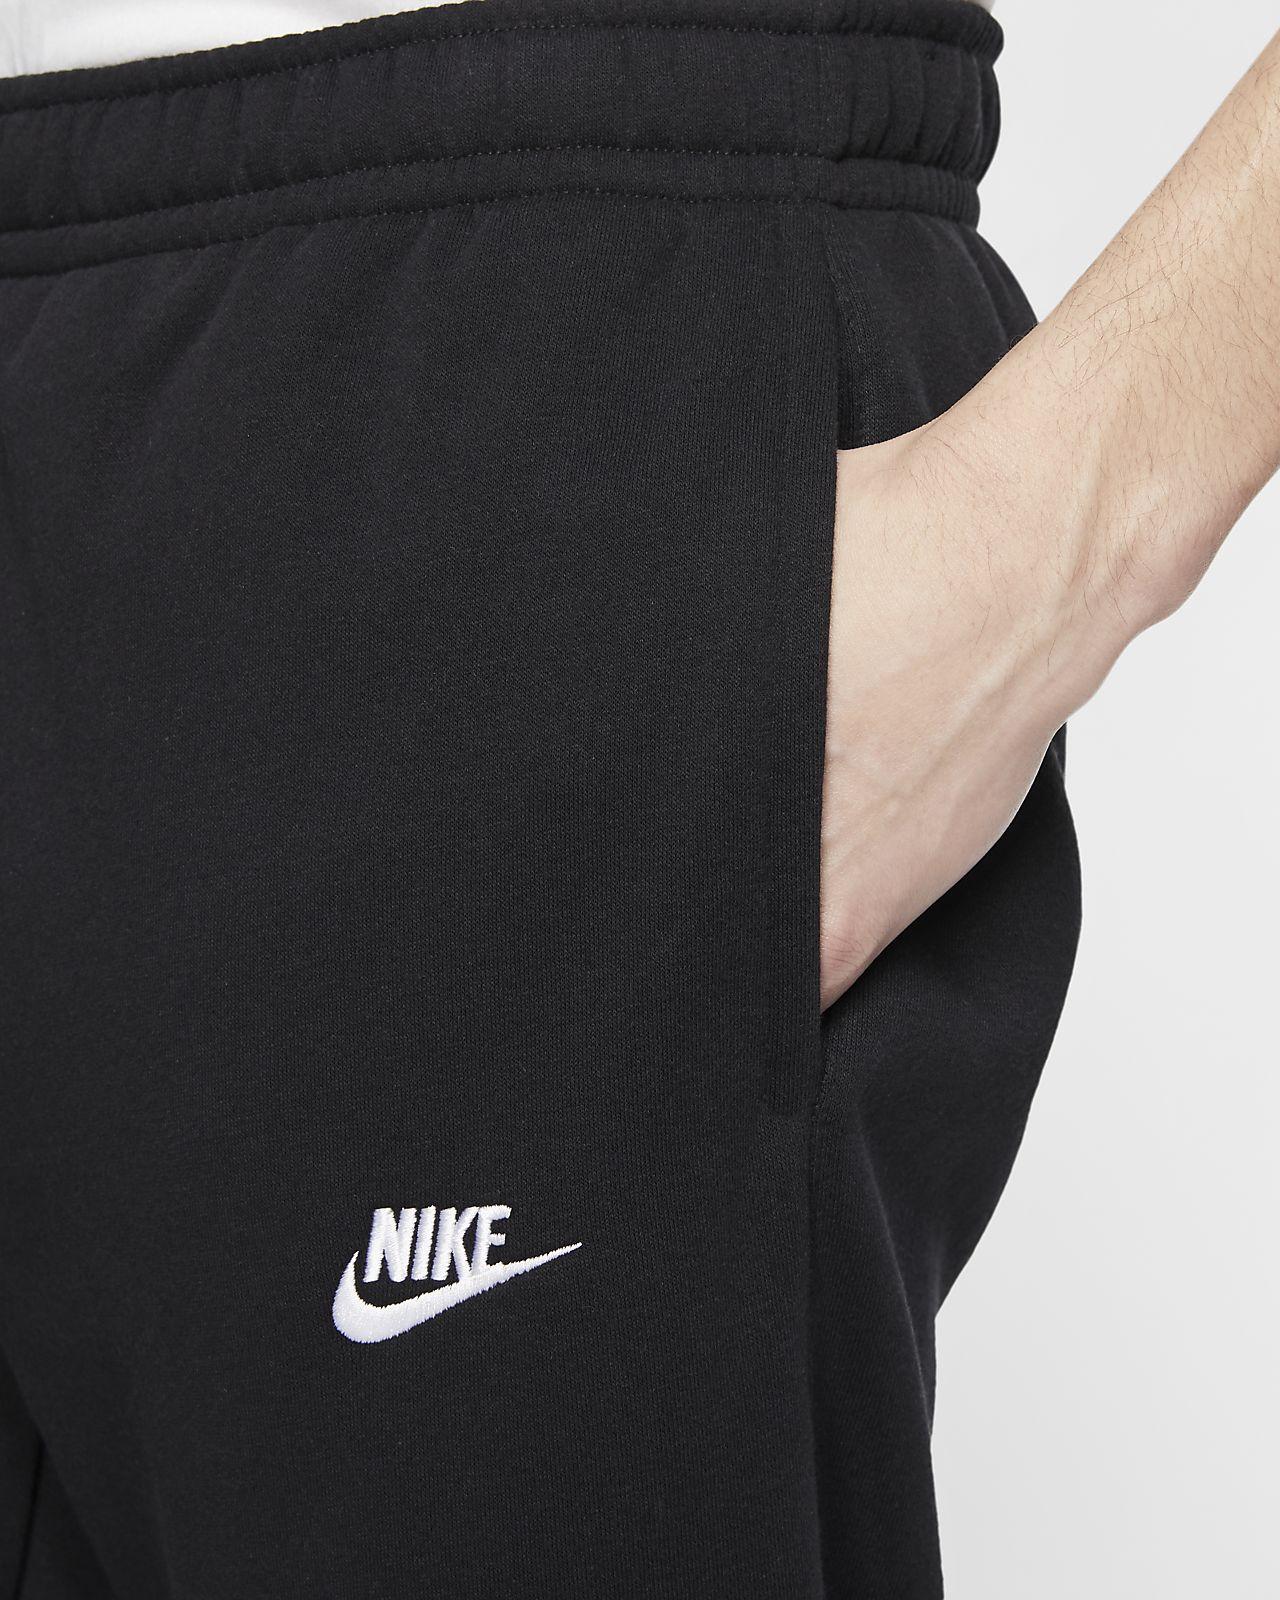 Novità Pantaloni Sportivi Sportswear Club Fleece Nike, Uomo